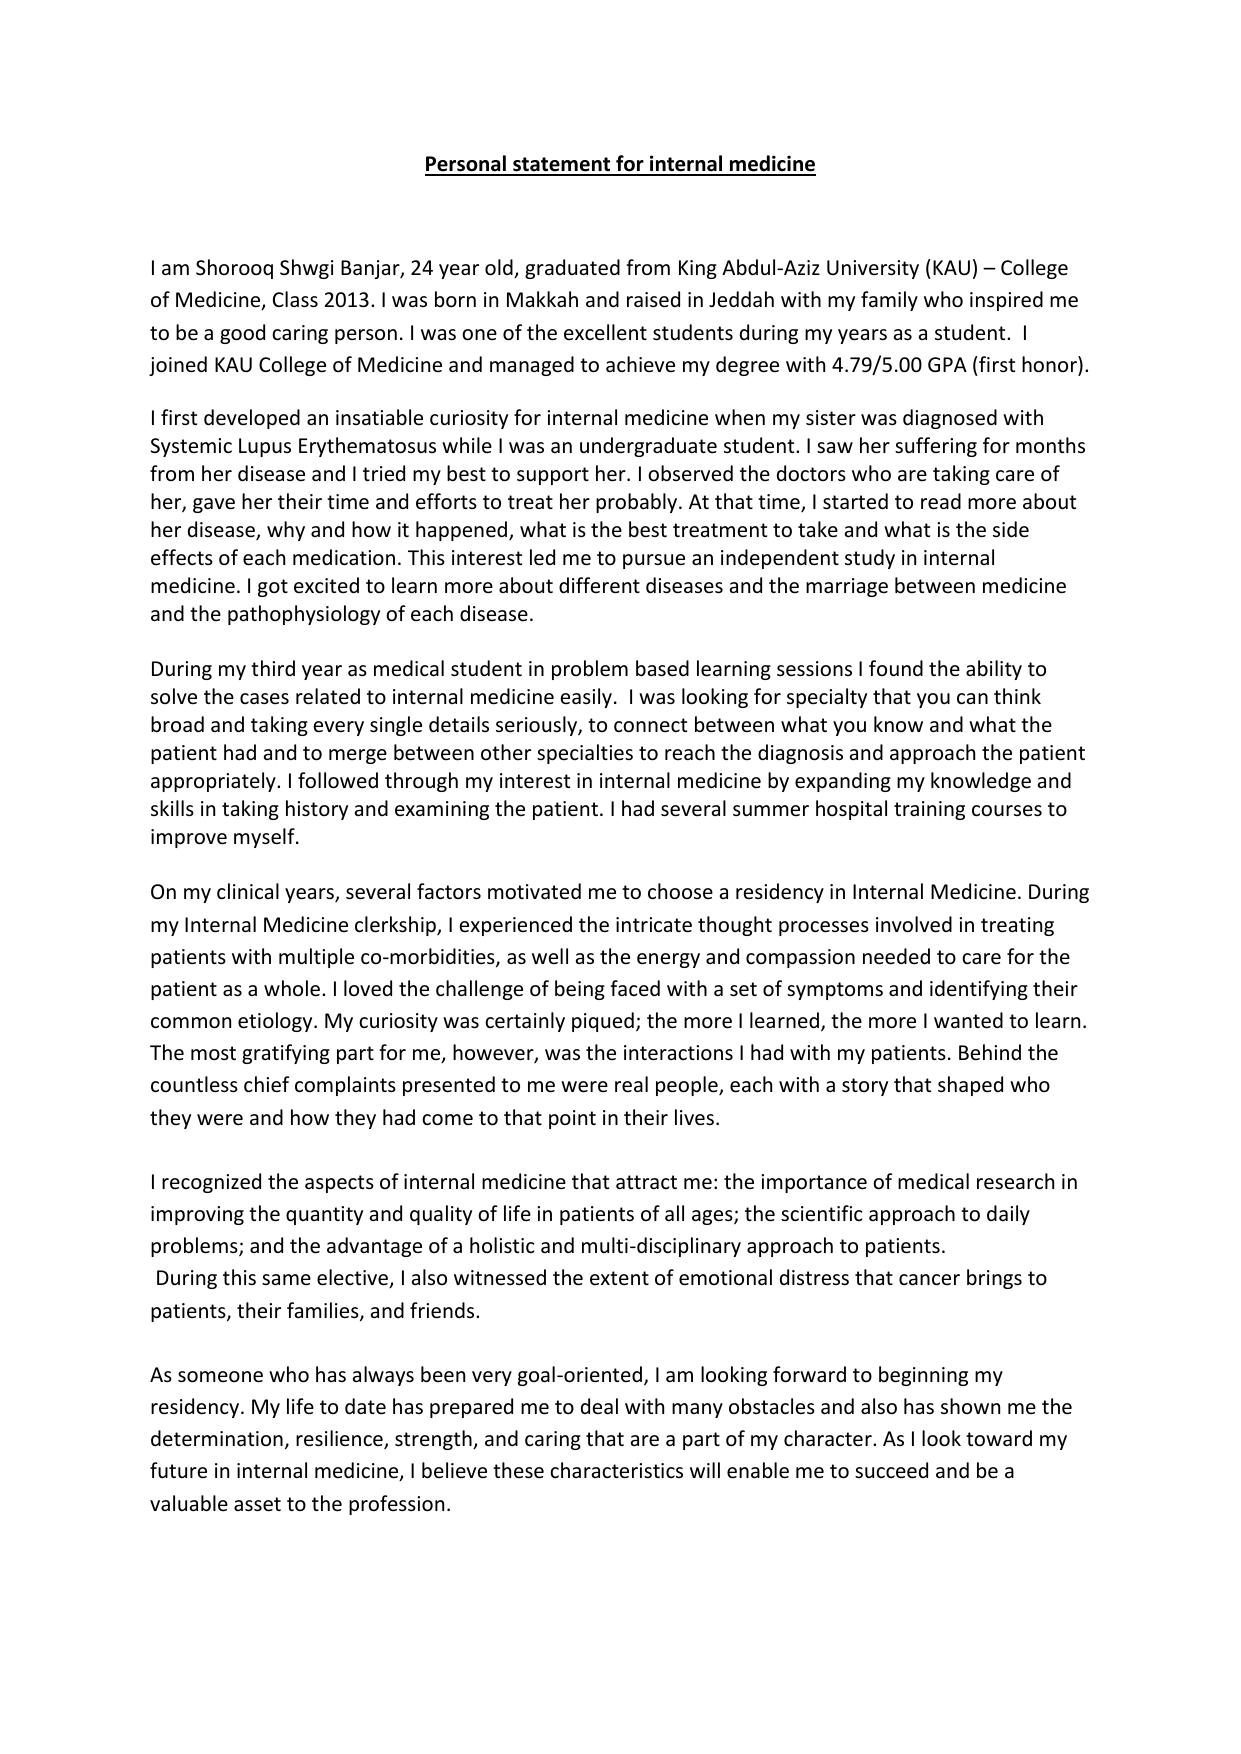 personal statement for internal medicine i am shorooq shwgi banjar